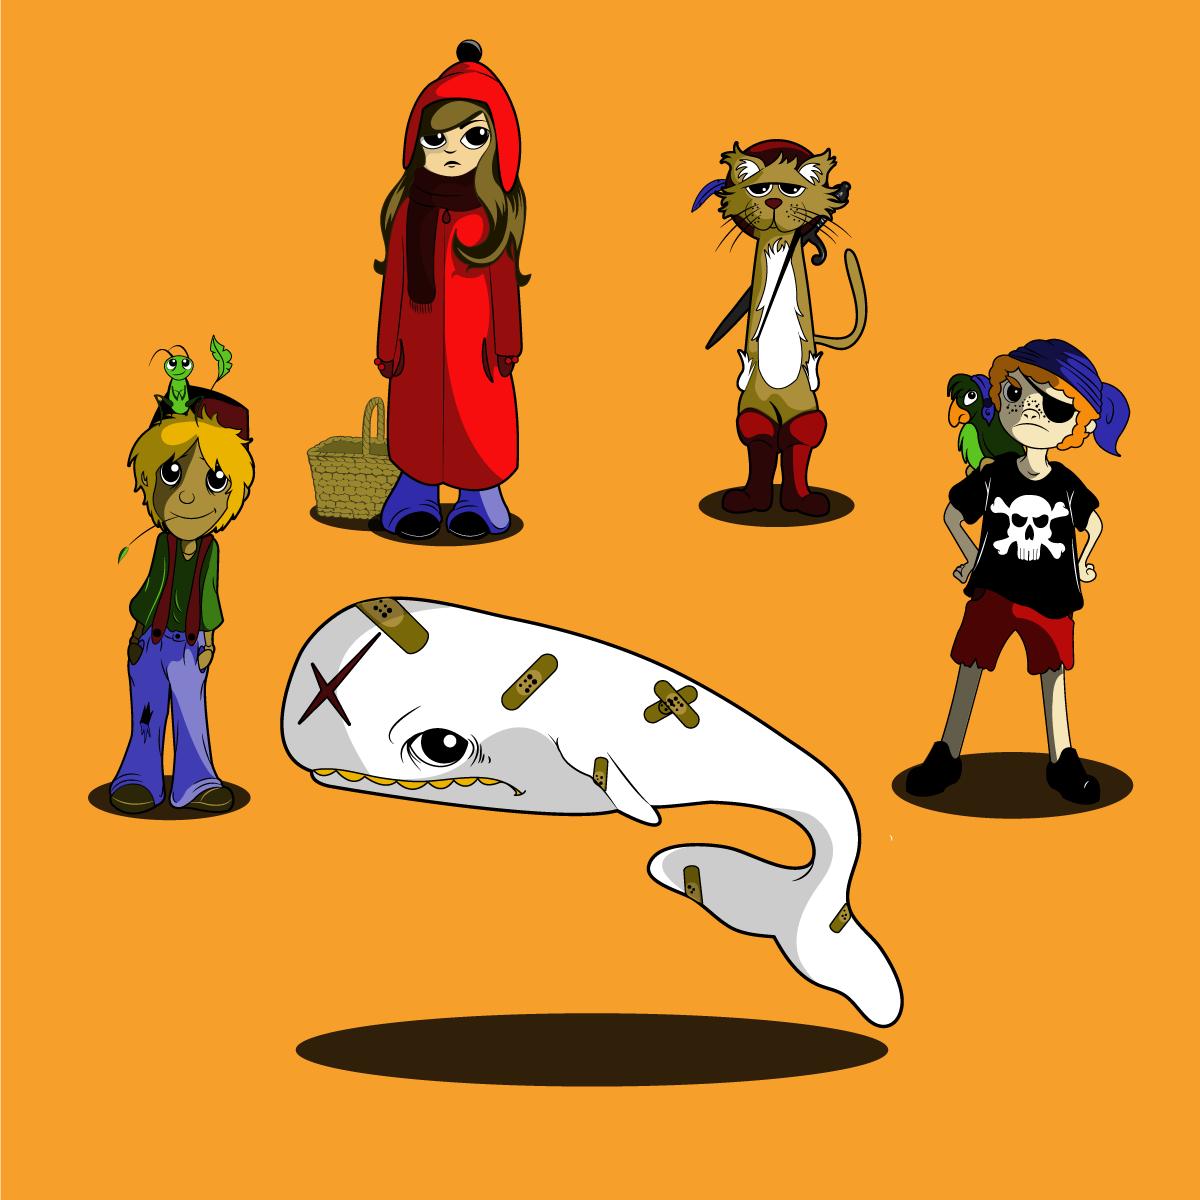 Character Designer Pay : Elegant playful restaurant character designs for a